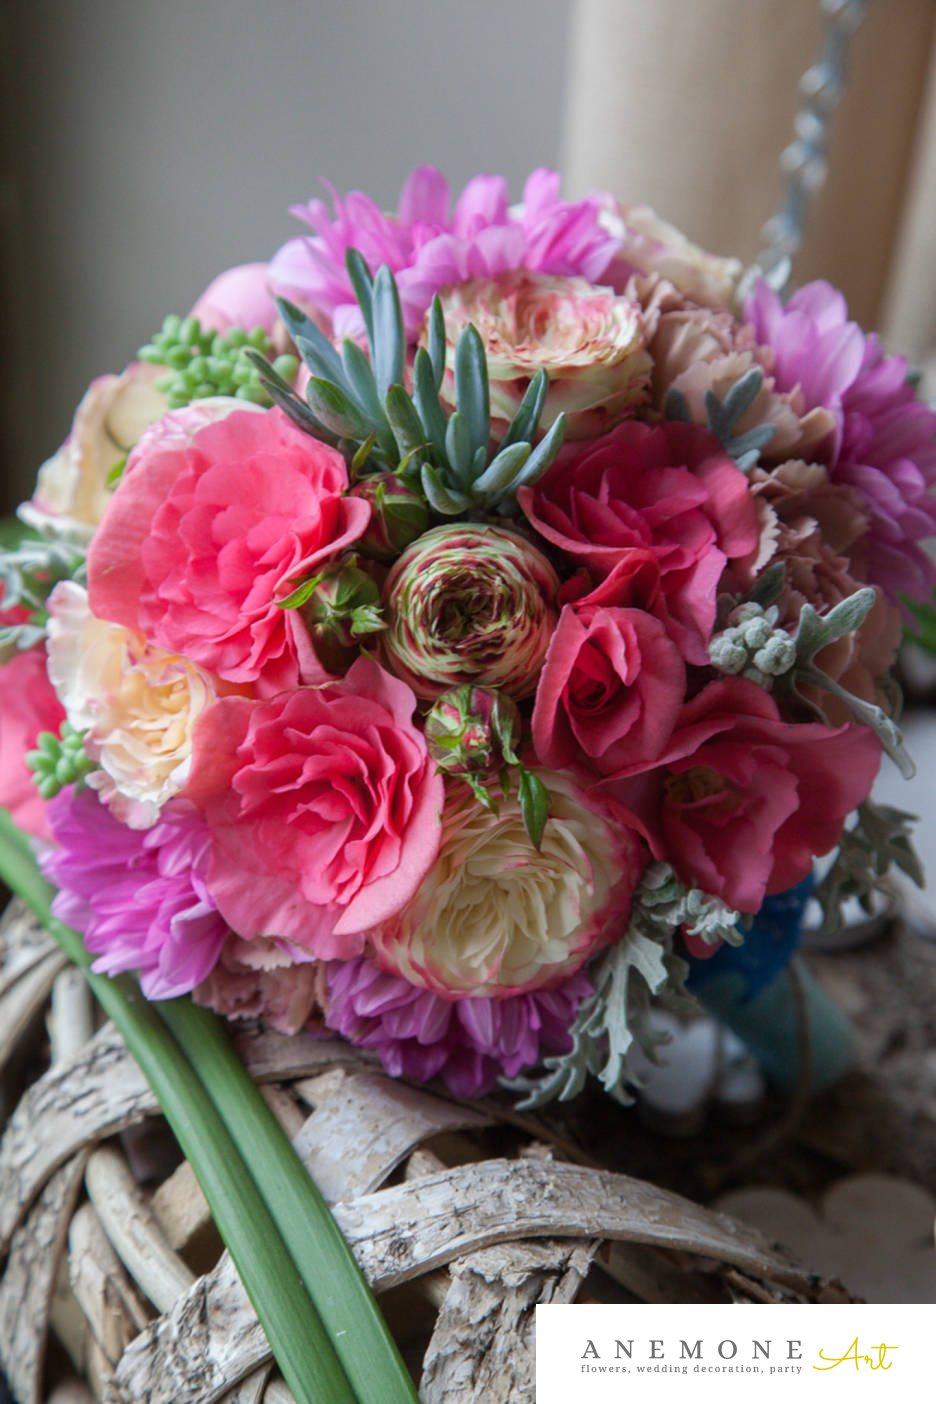 Poza, foto cu Flori de nunta buchet mireasa, bujori, hortensia, multicolor, rotund, trandafiri englezesti in Arad, Timisoara, Oradea (wedding flowers, bouquets) nunta Arad, Timisoara, Oradea